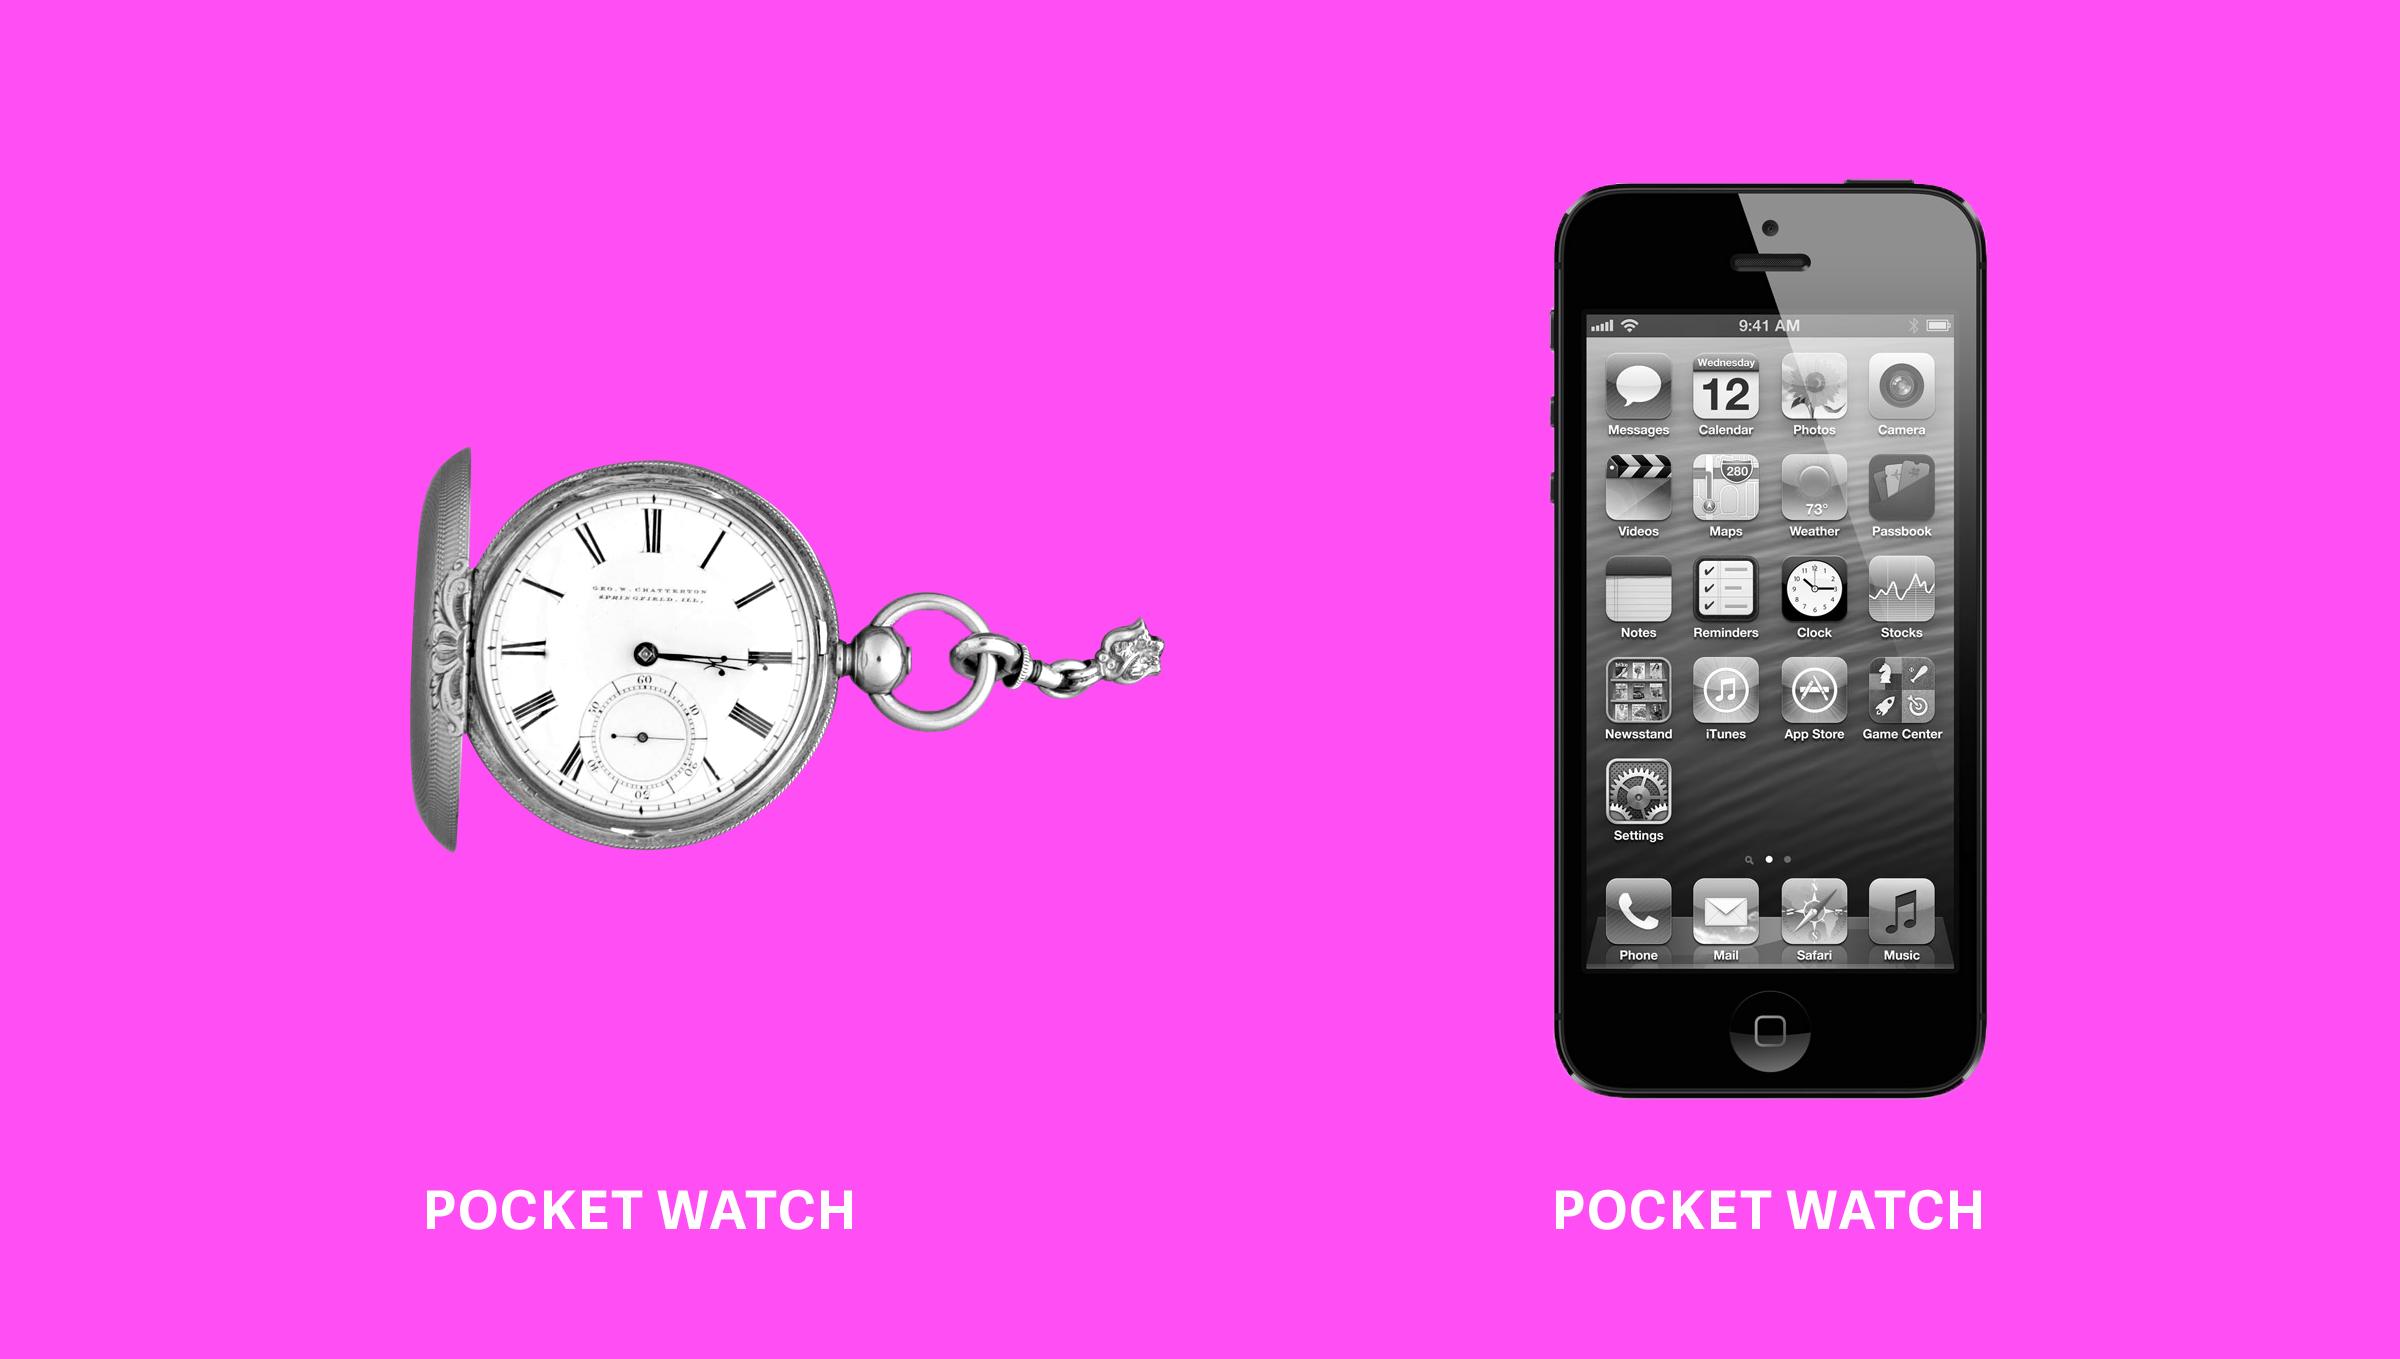 pocketwatch_001